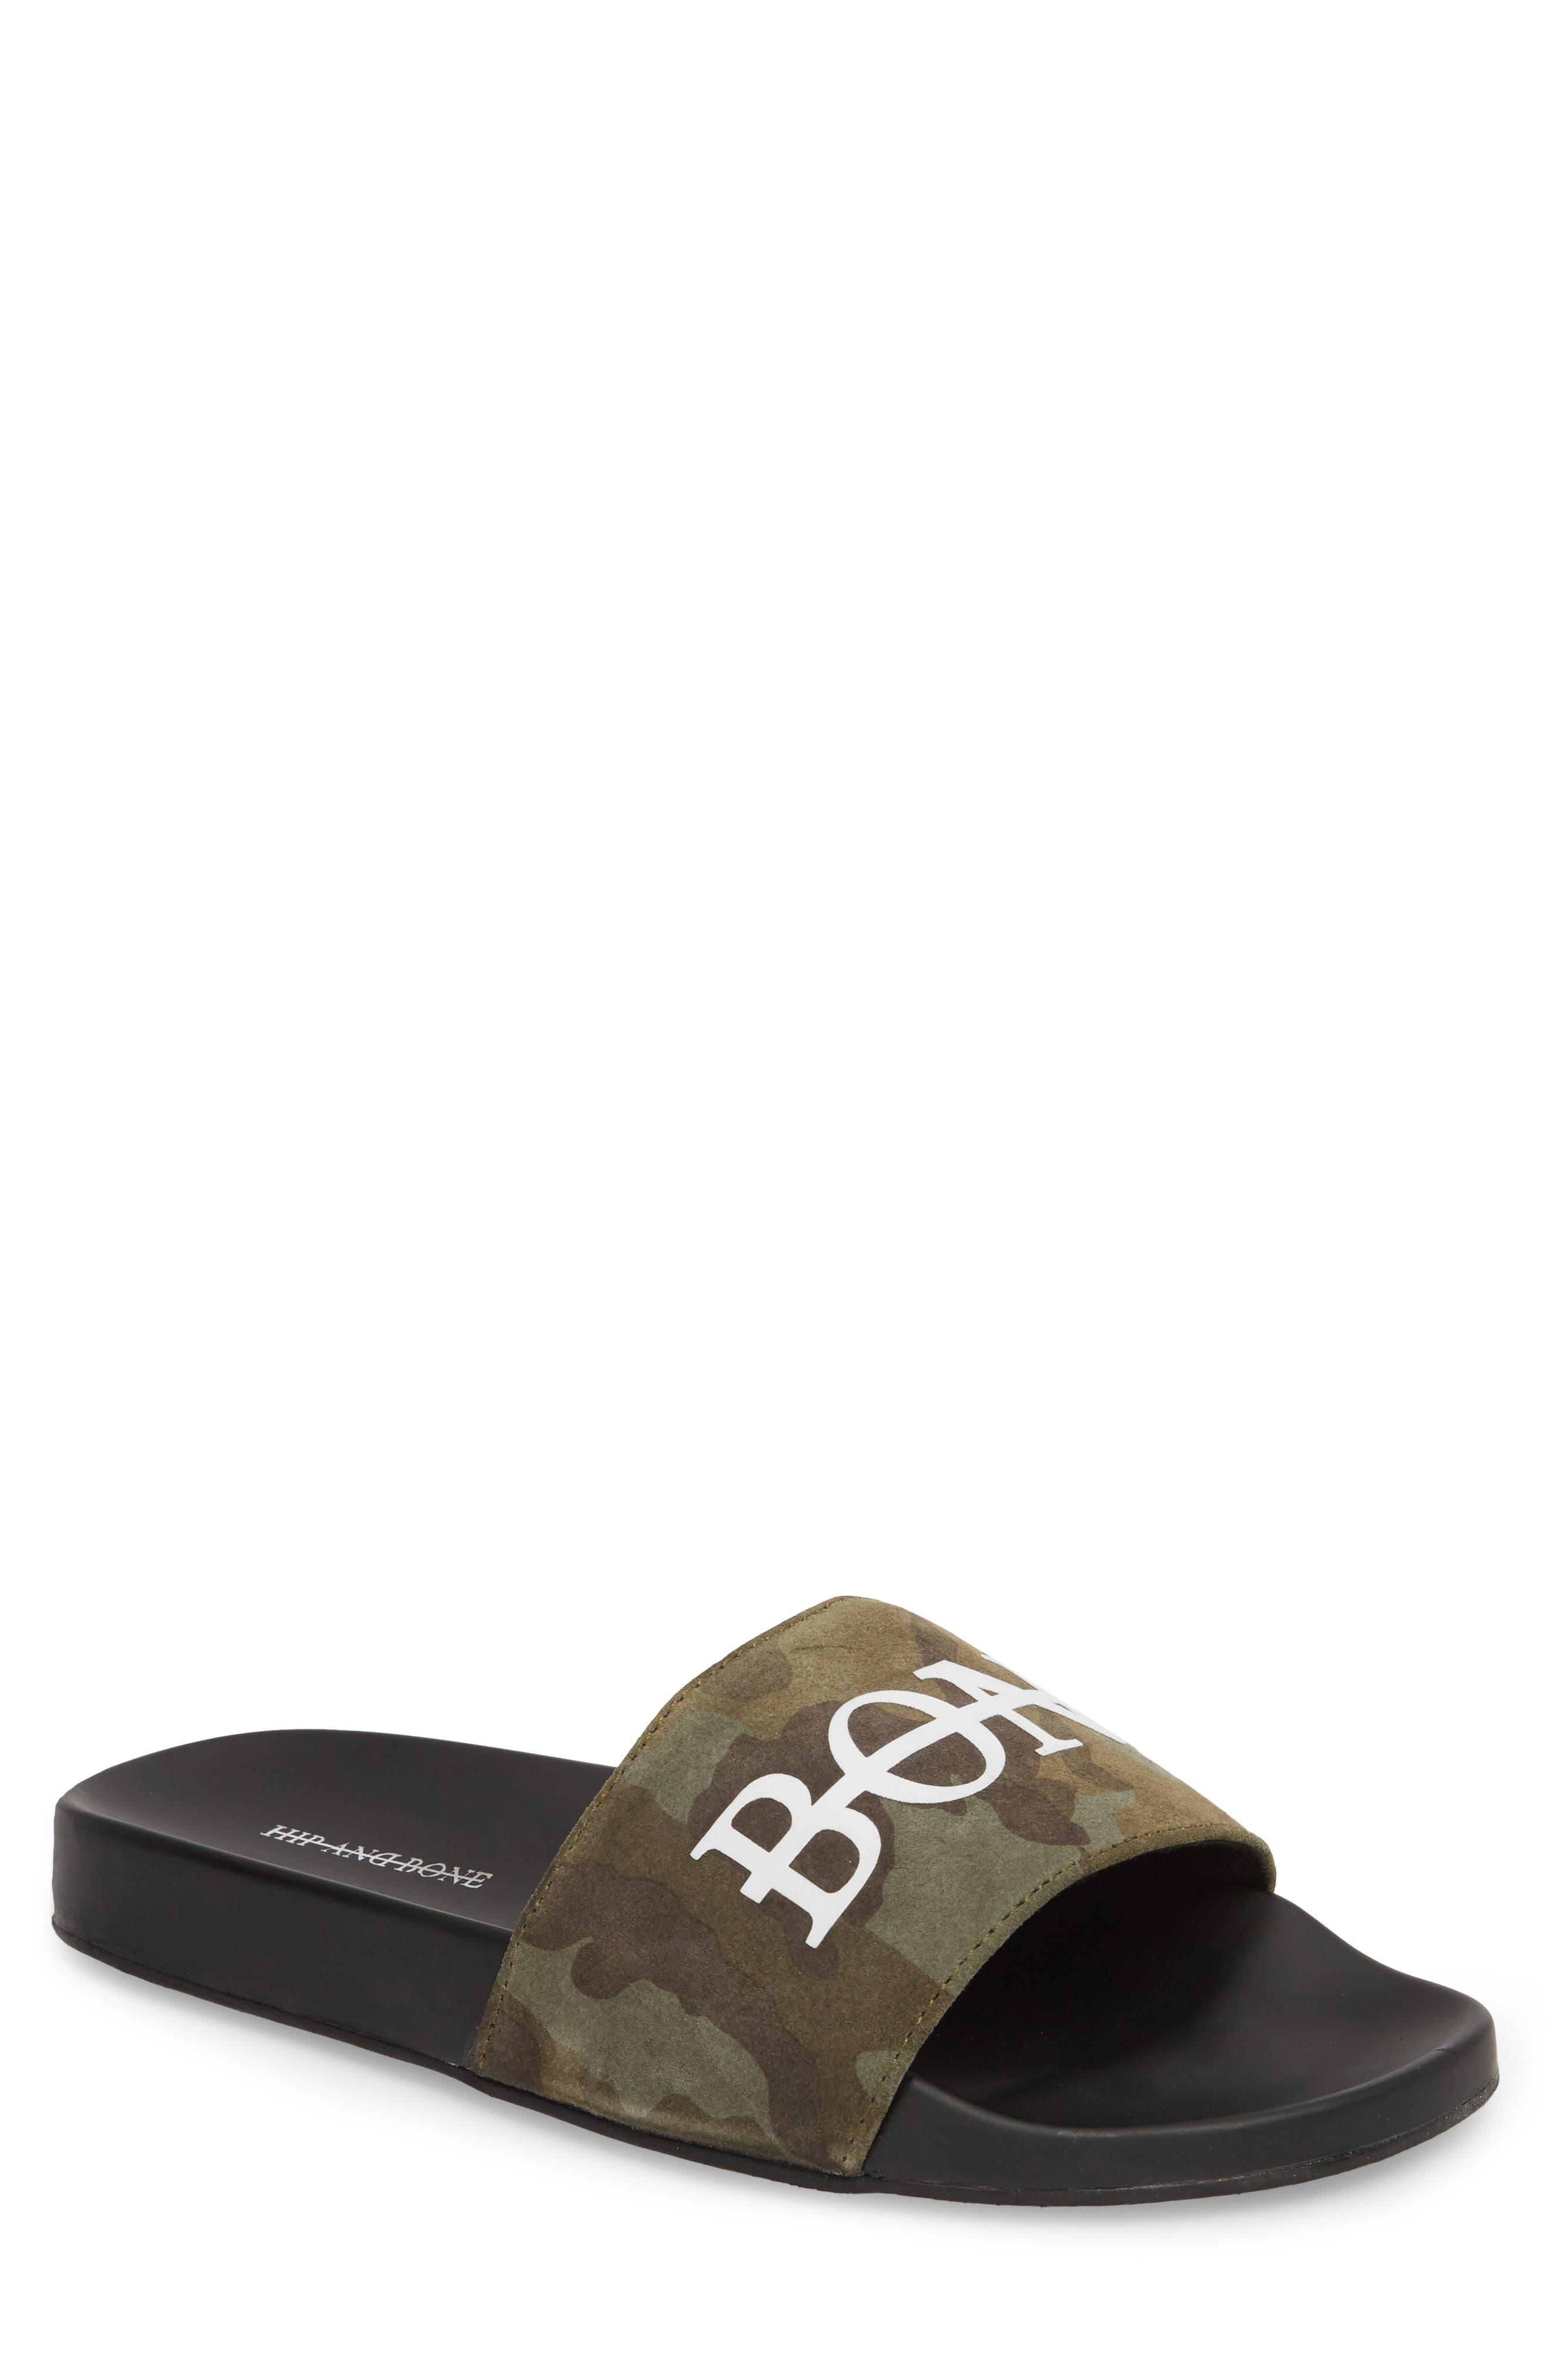 HB Sport Slide,                         Main,                         color, Green Camo Suede